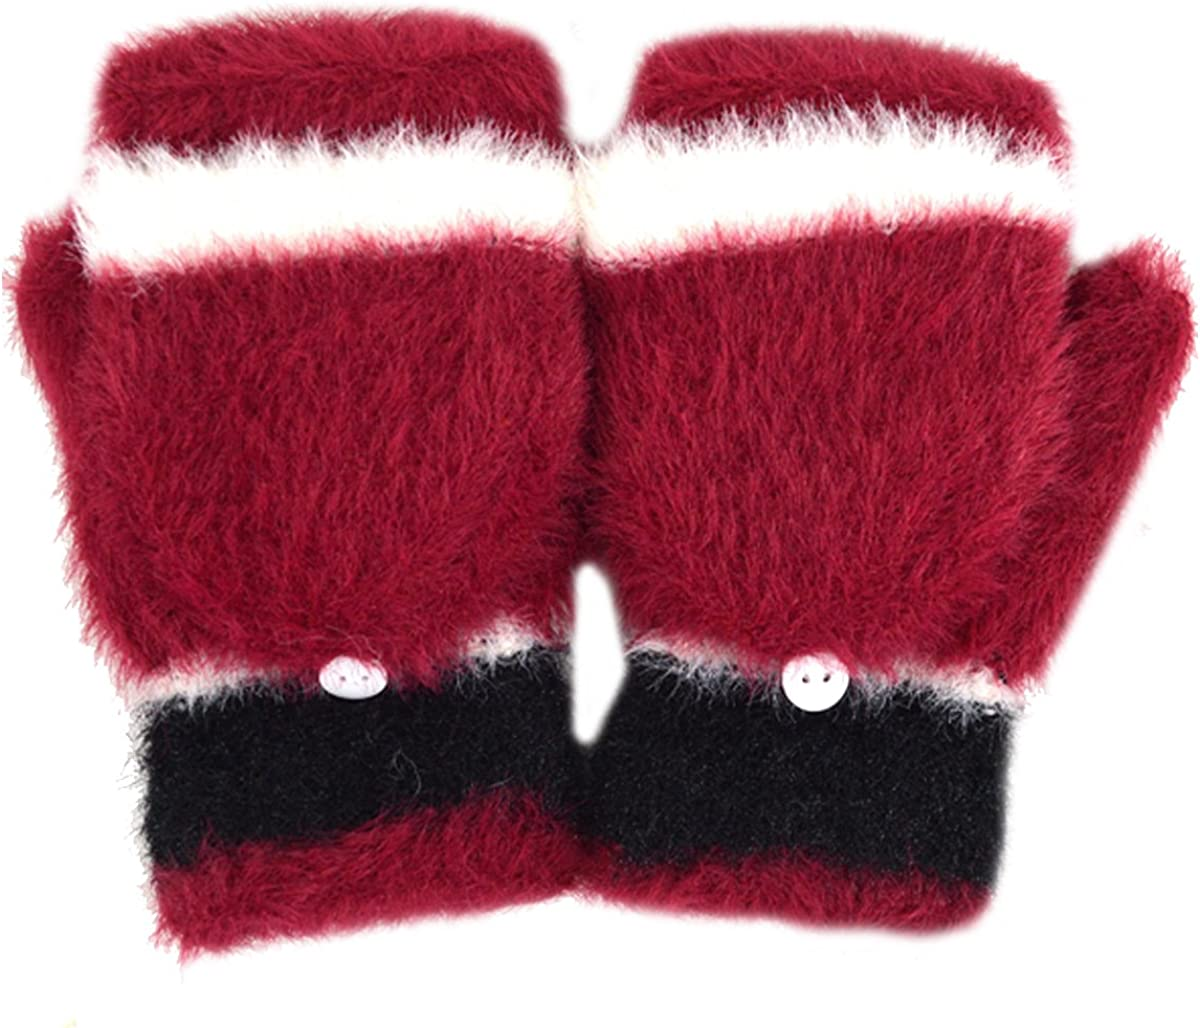 CLARA Women Cute Plush Faux Fur Mittens Half Finger Gloves Flip Top Convertible Mitts